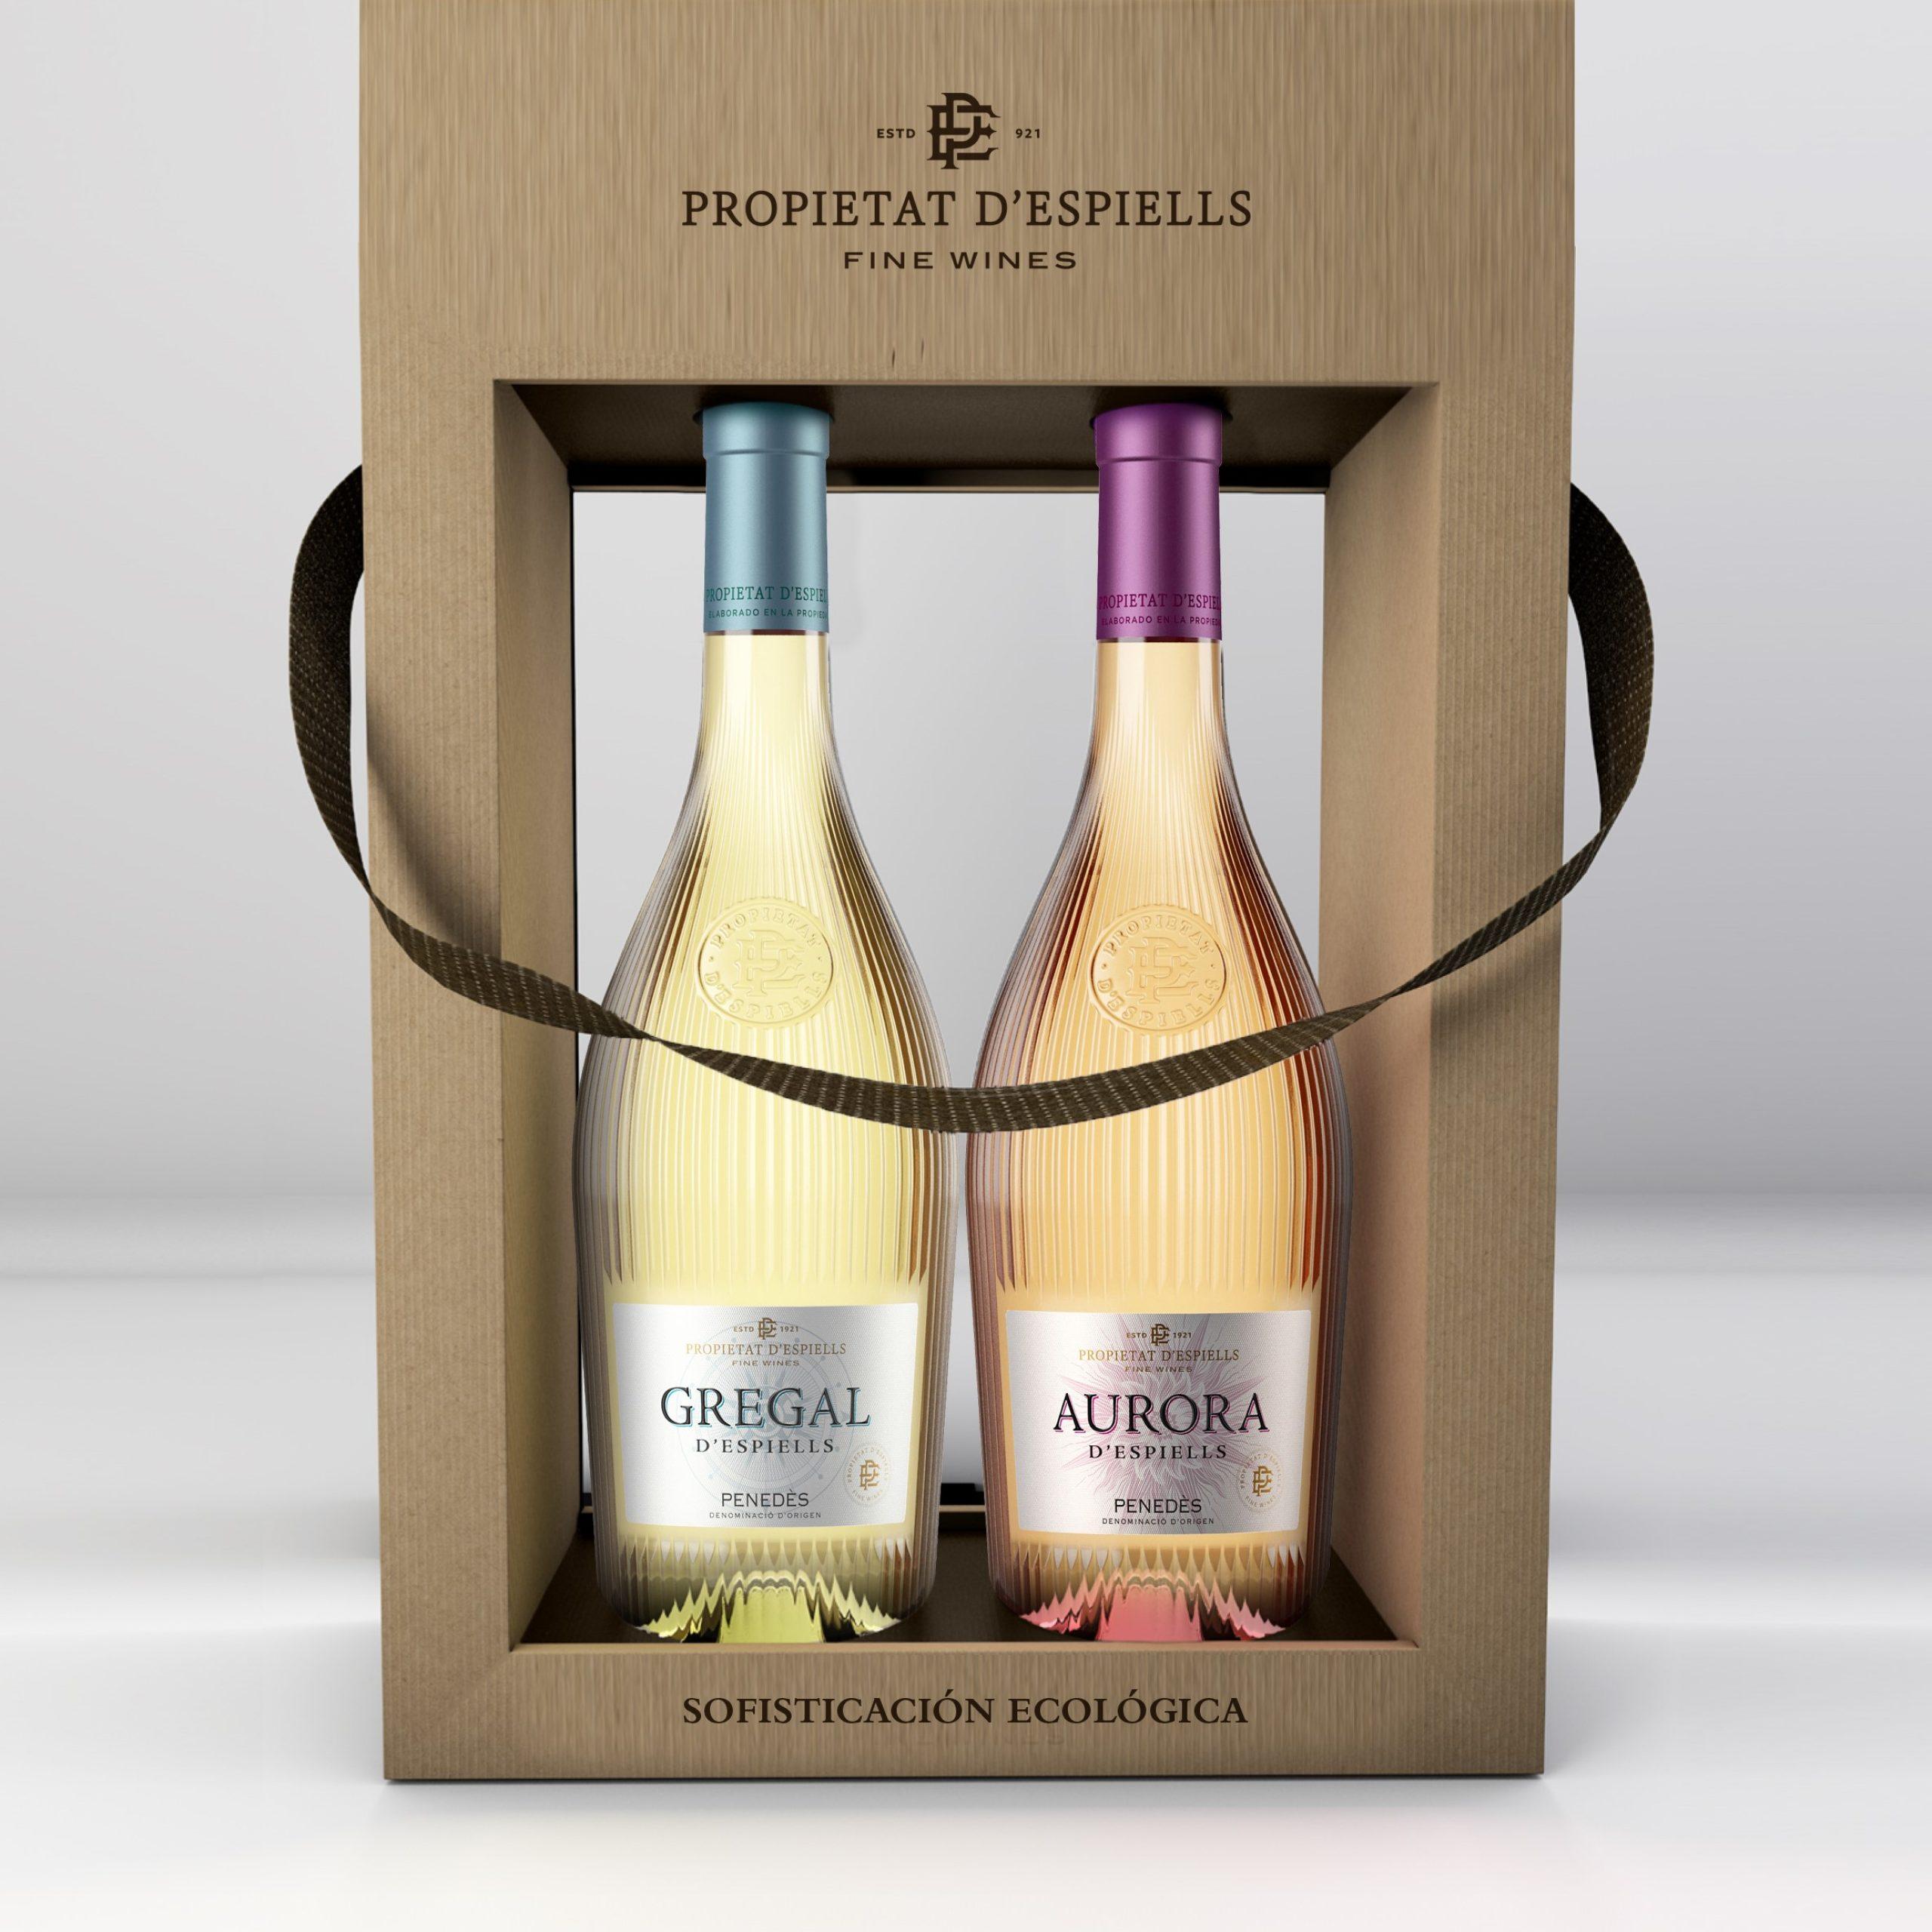 pack vinos propietat despiells penedes